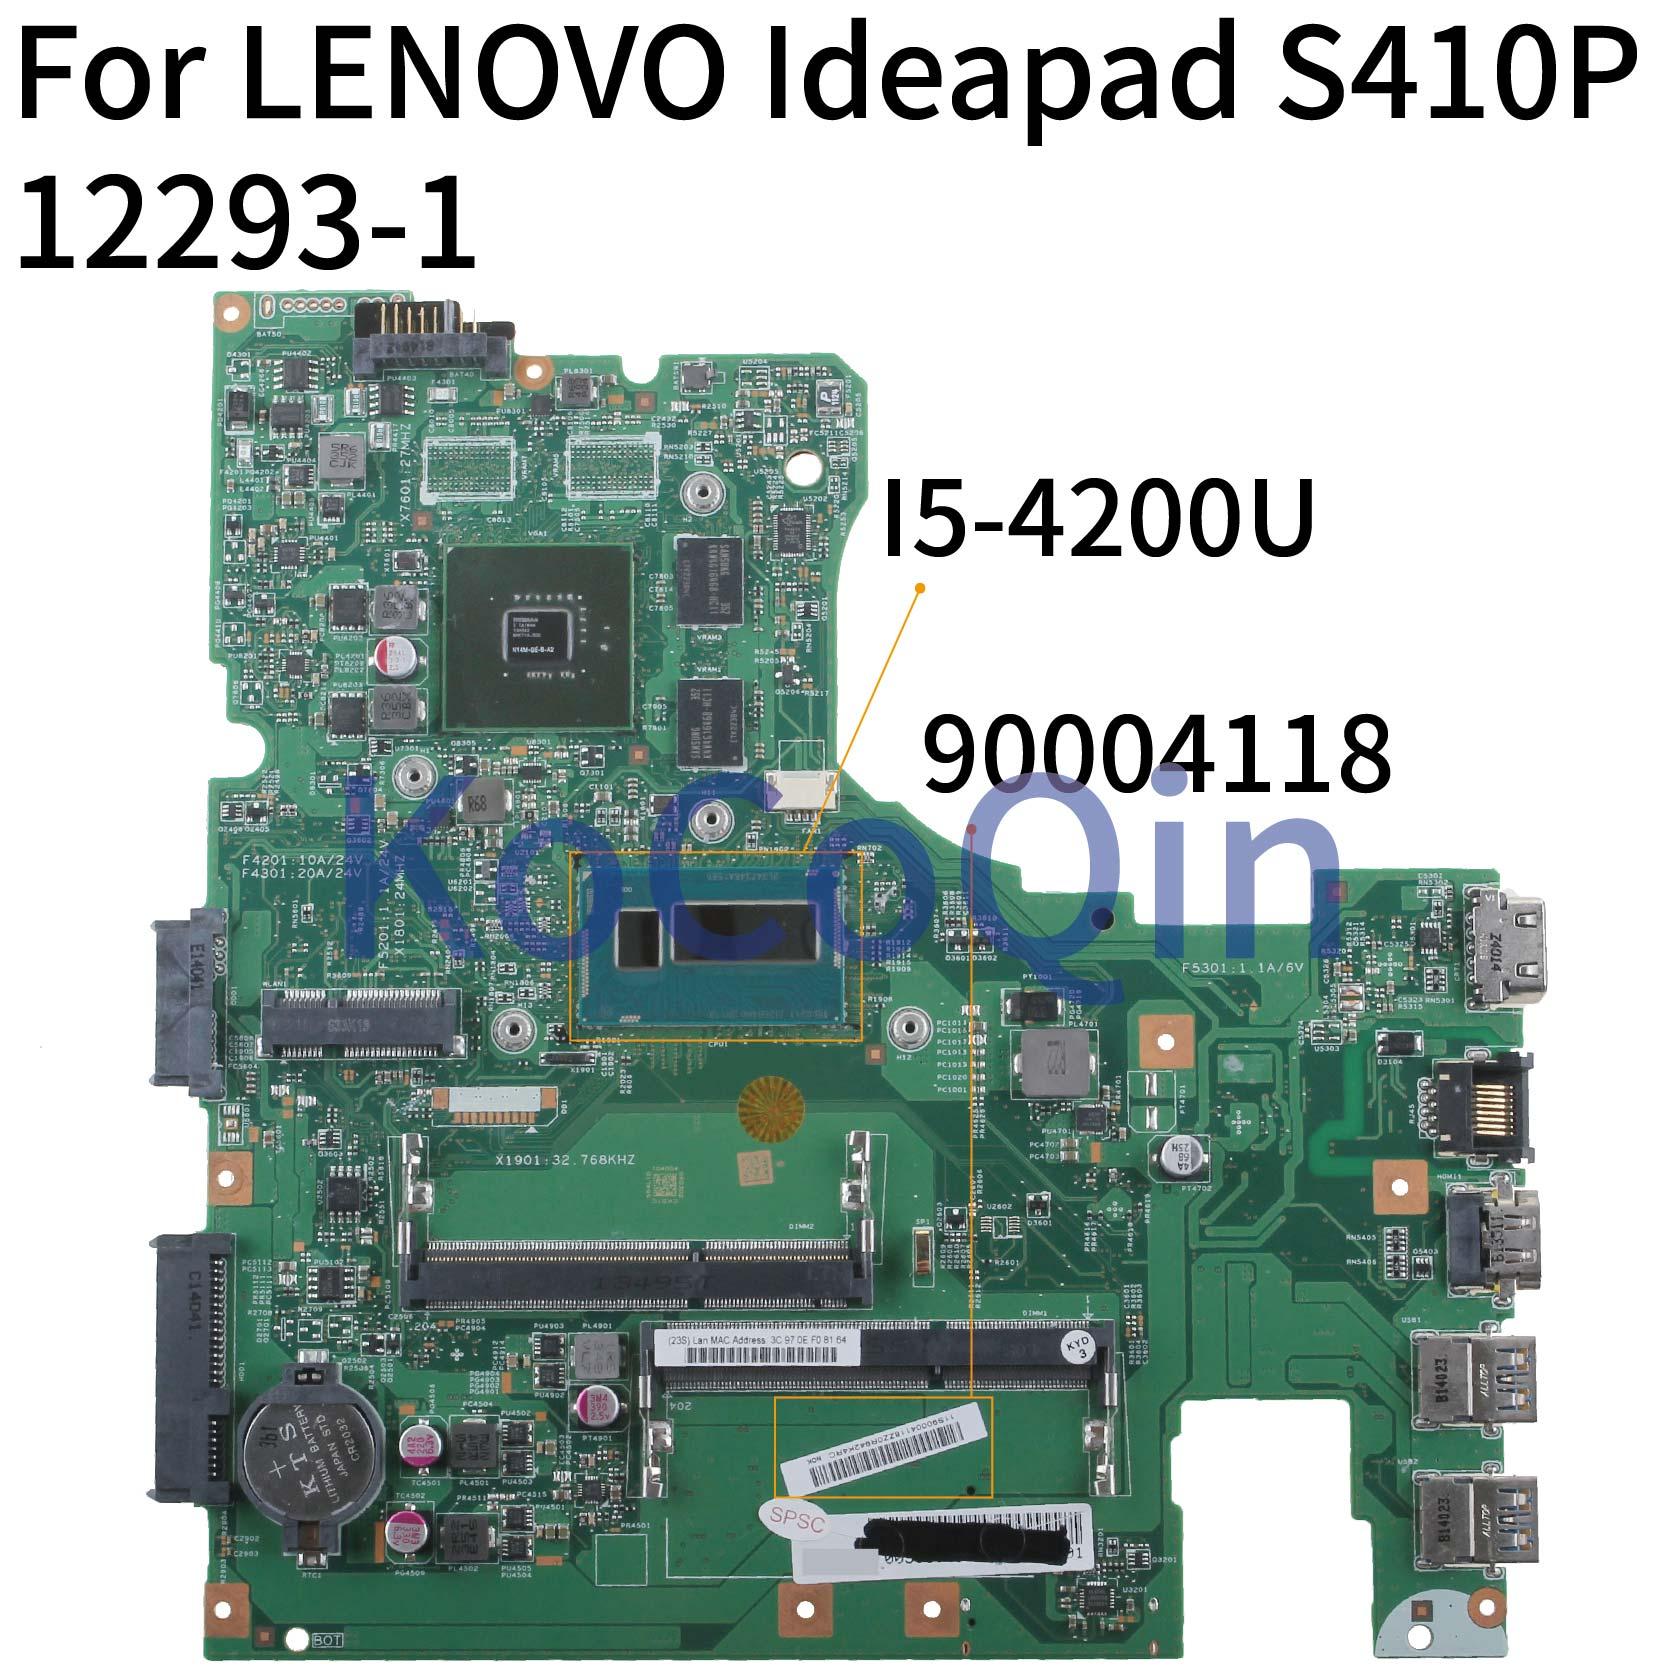 KoCoQin Laptop Motherboard For LENOVO Ideapad S410P I5-4200U 14' Inch Mainboard 12293-1 48.4L106.011 90004118 N14M-GE-B-A2